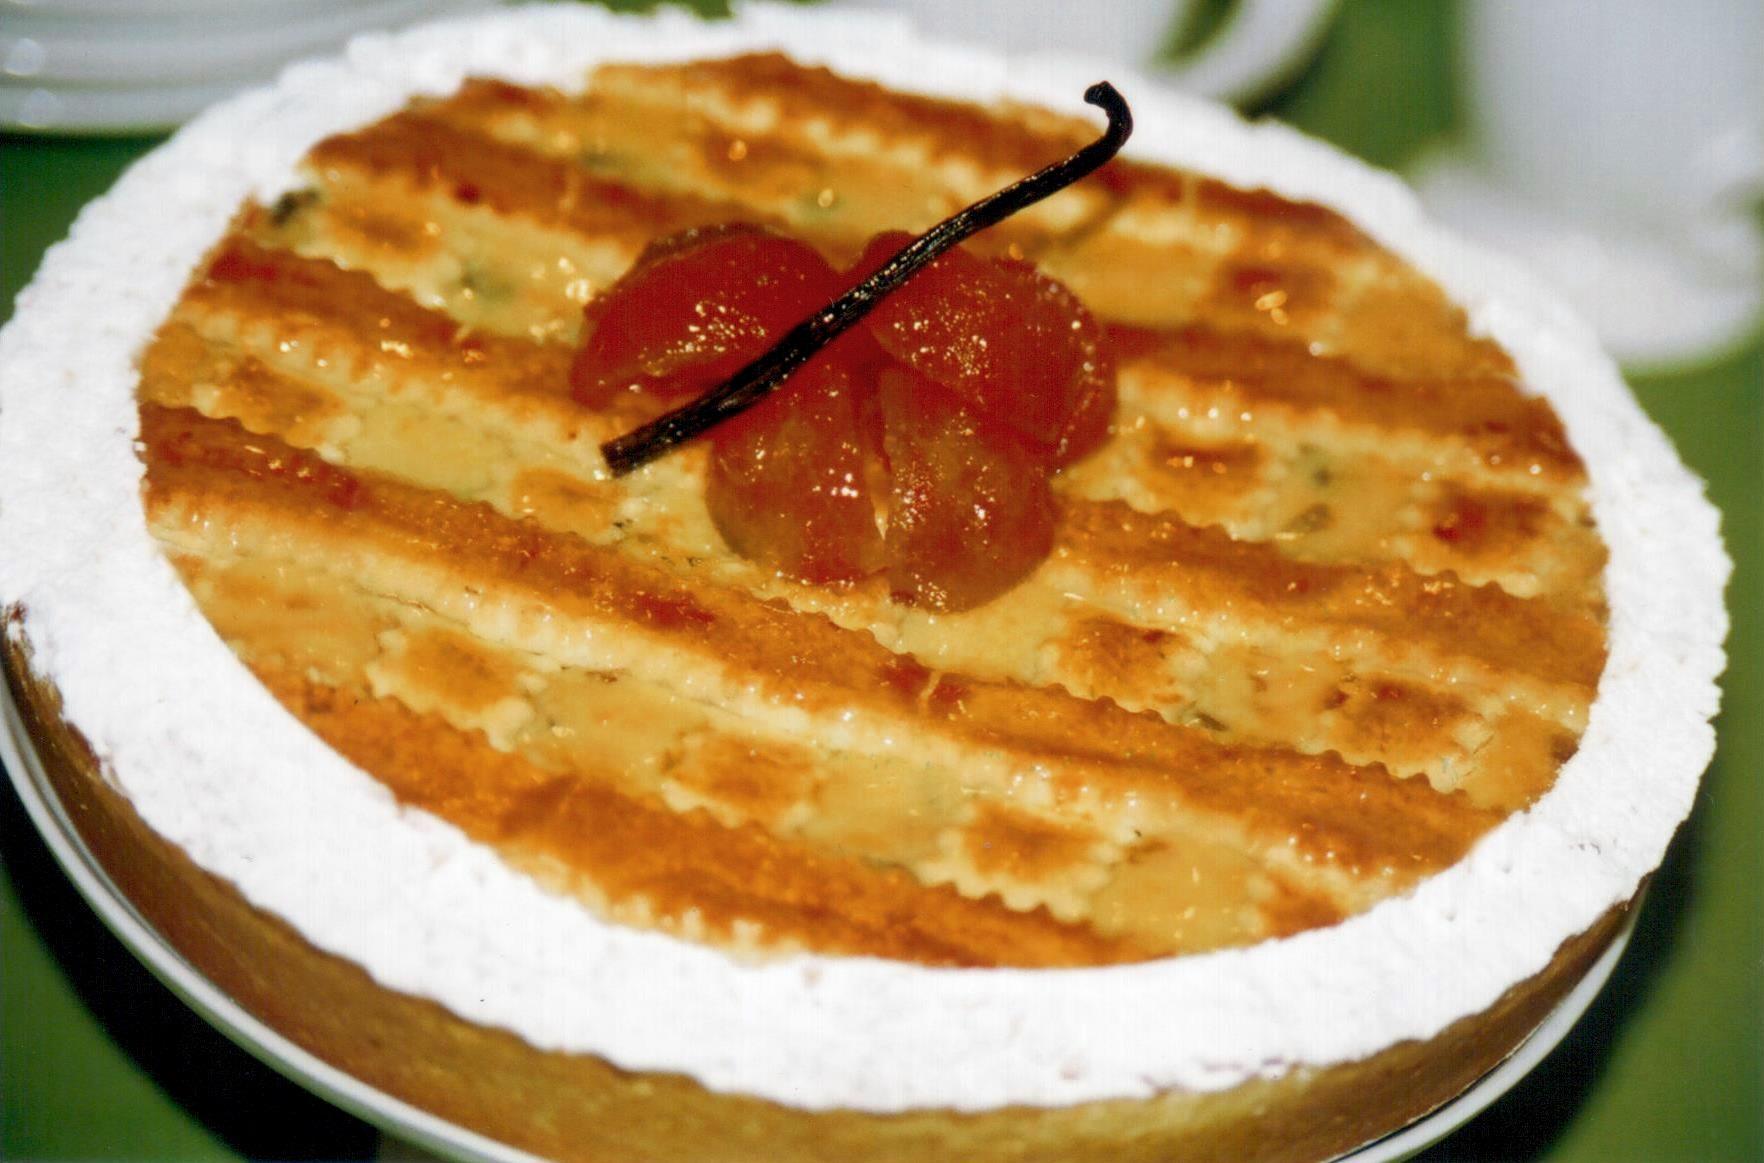 TORTA CROCANTE DE RICOTA